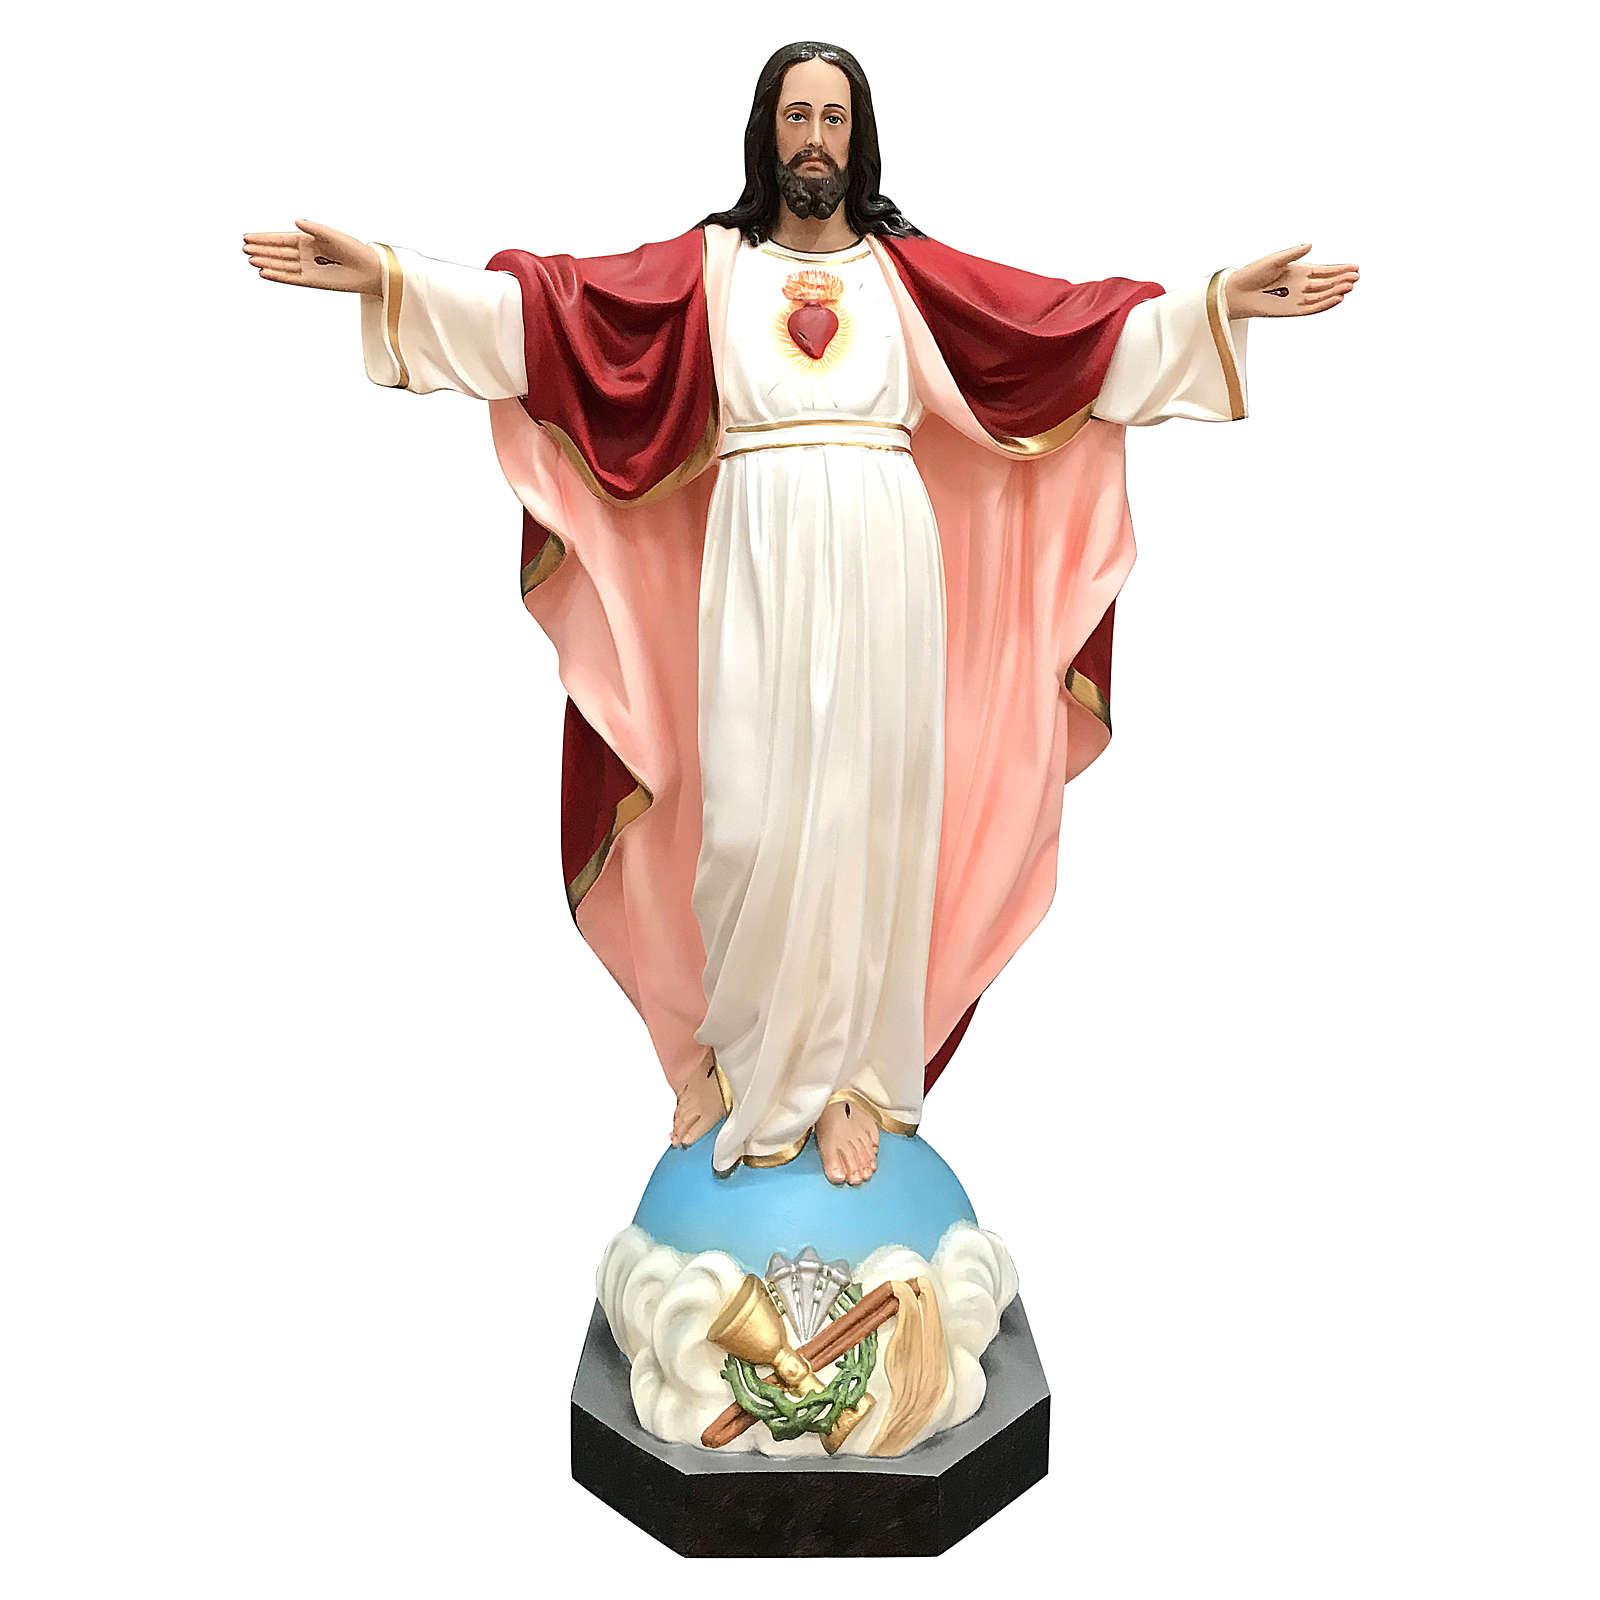 Statua Gesù Sacro Cuore braccia aperte 85 cm vetroresina dipinta 4